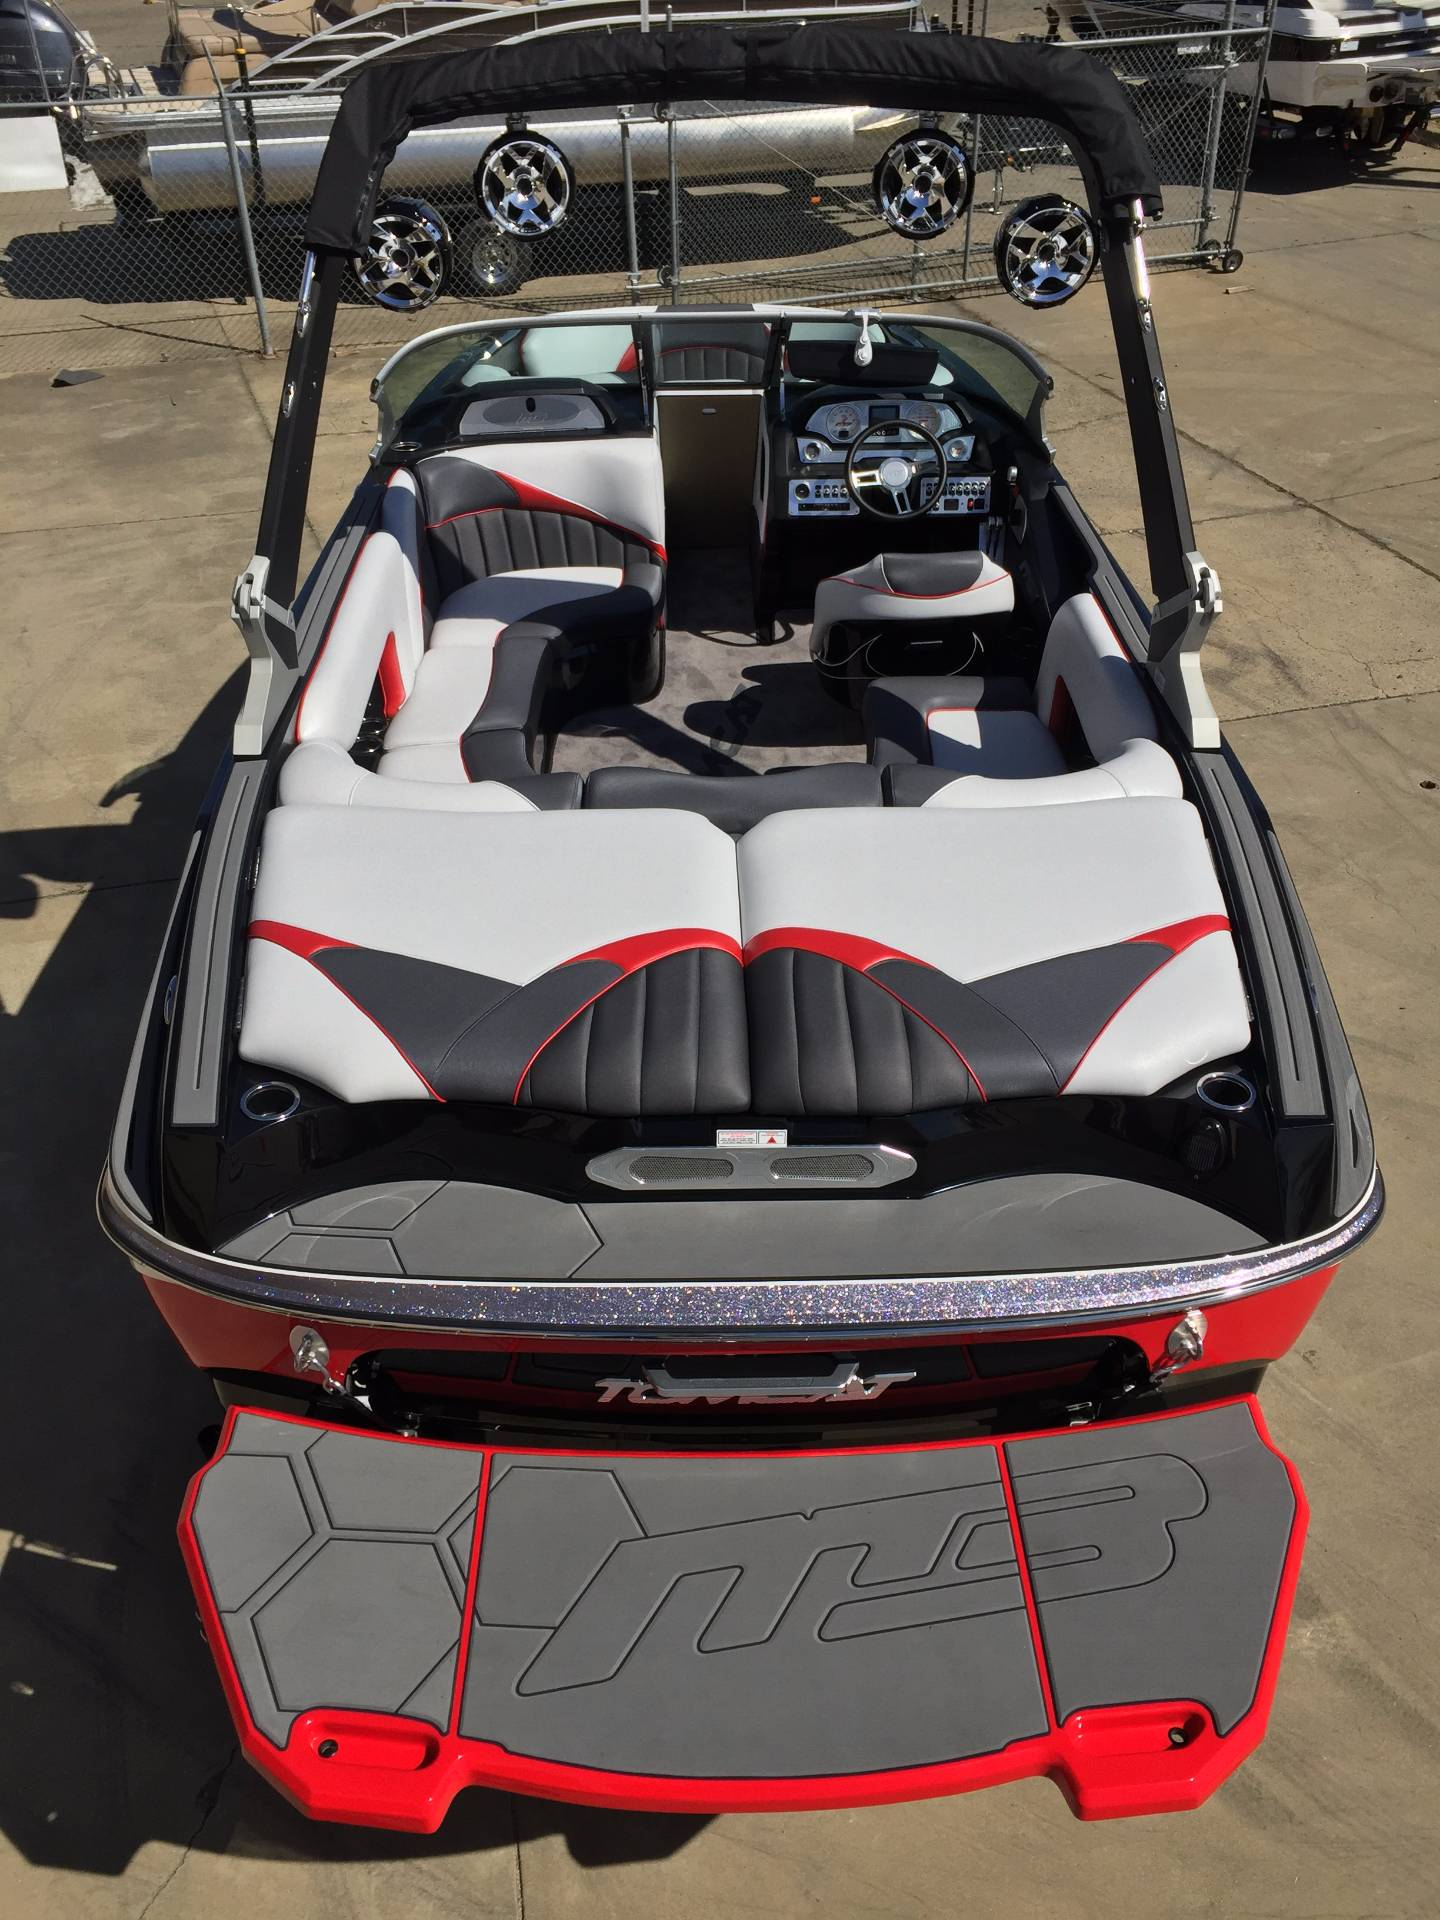 2017 MB F21 Tomcat in Rancho Cordova, California